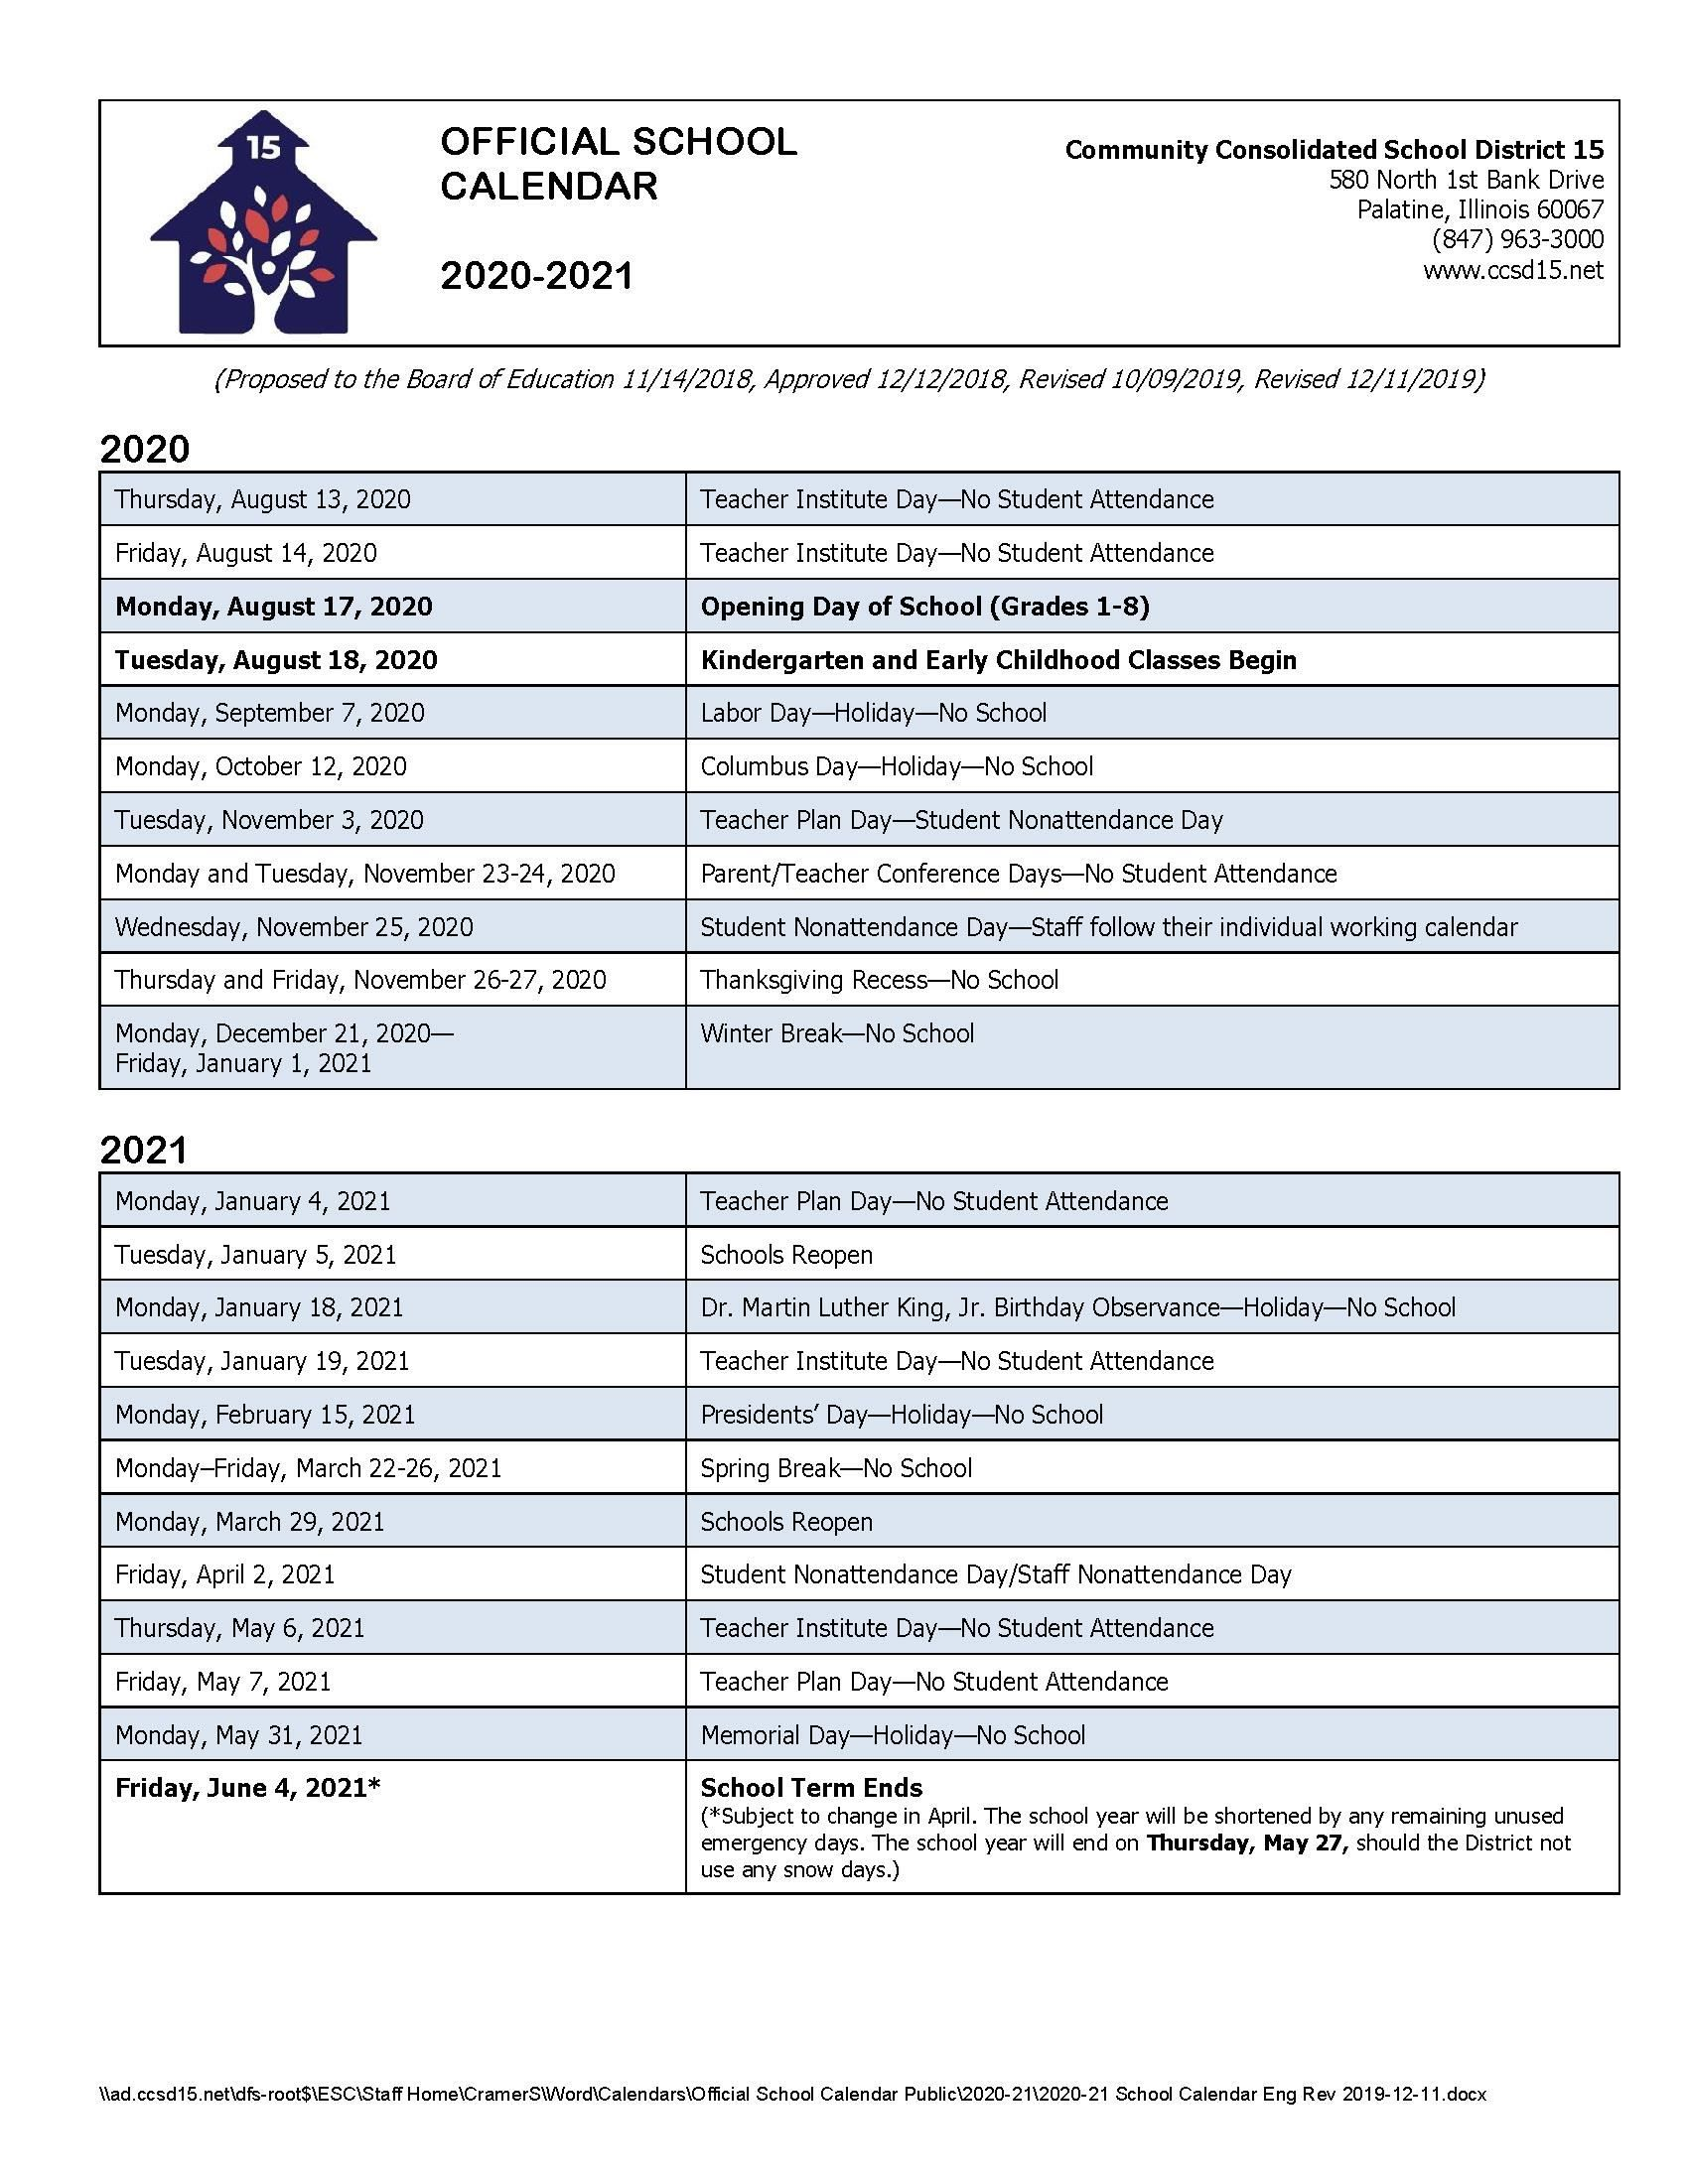 American University Academic Calendar 2022.Chamberlain University Schedule 2021 Calendar Board Printable Calendar 2020 University Holidays